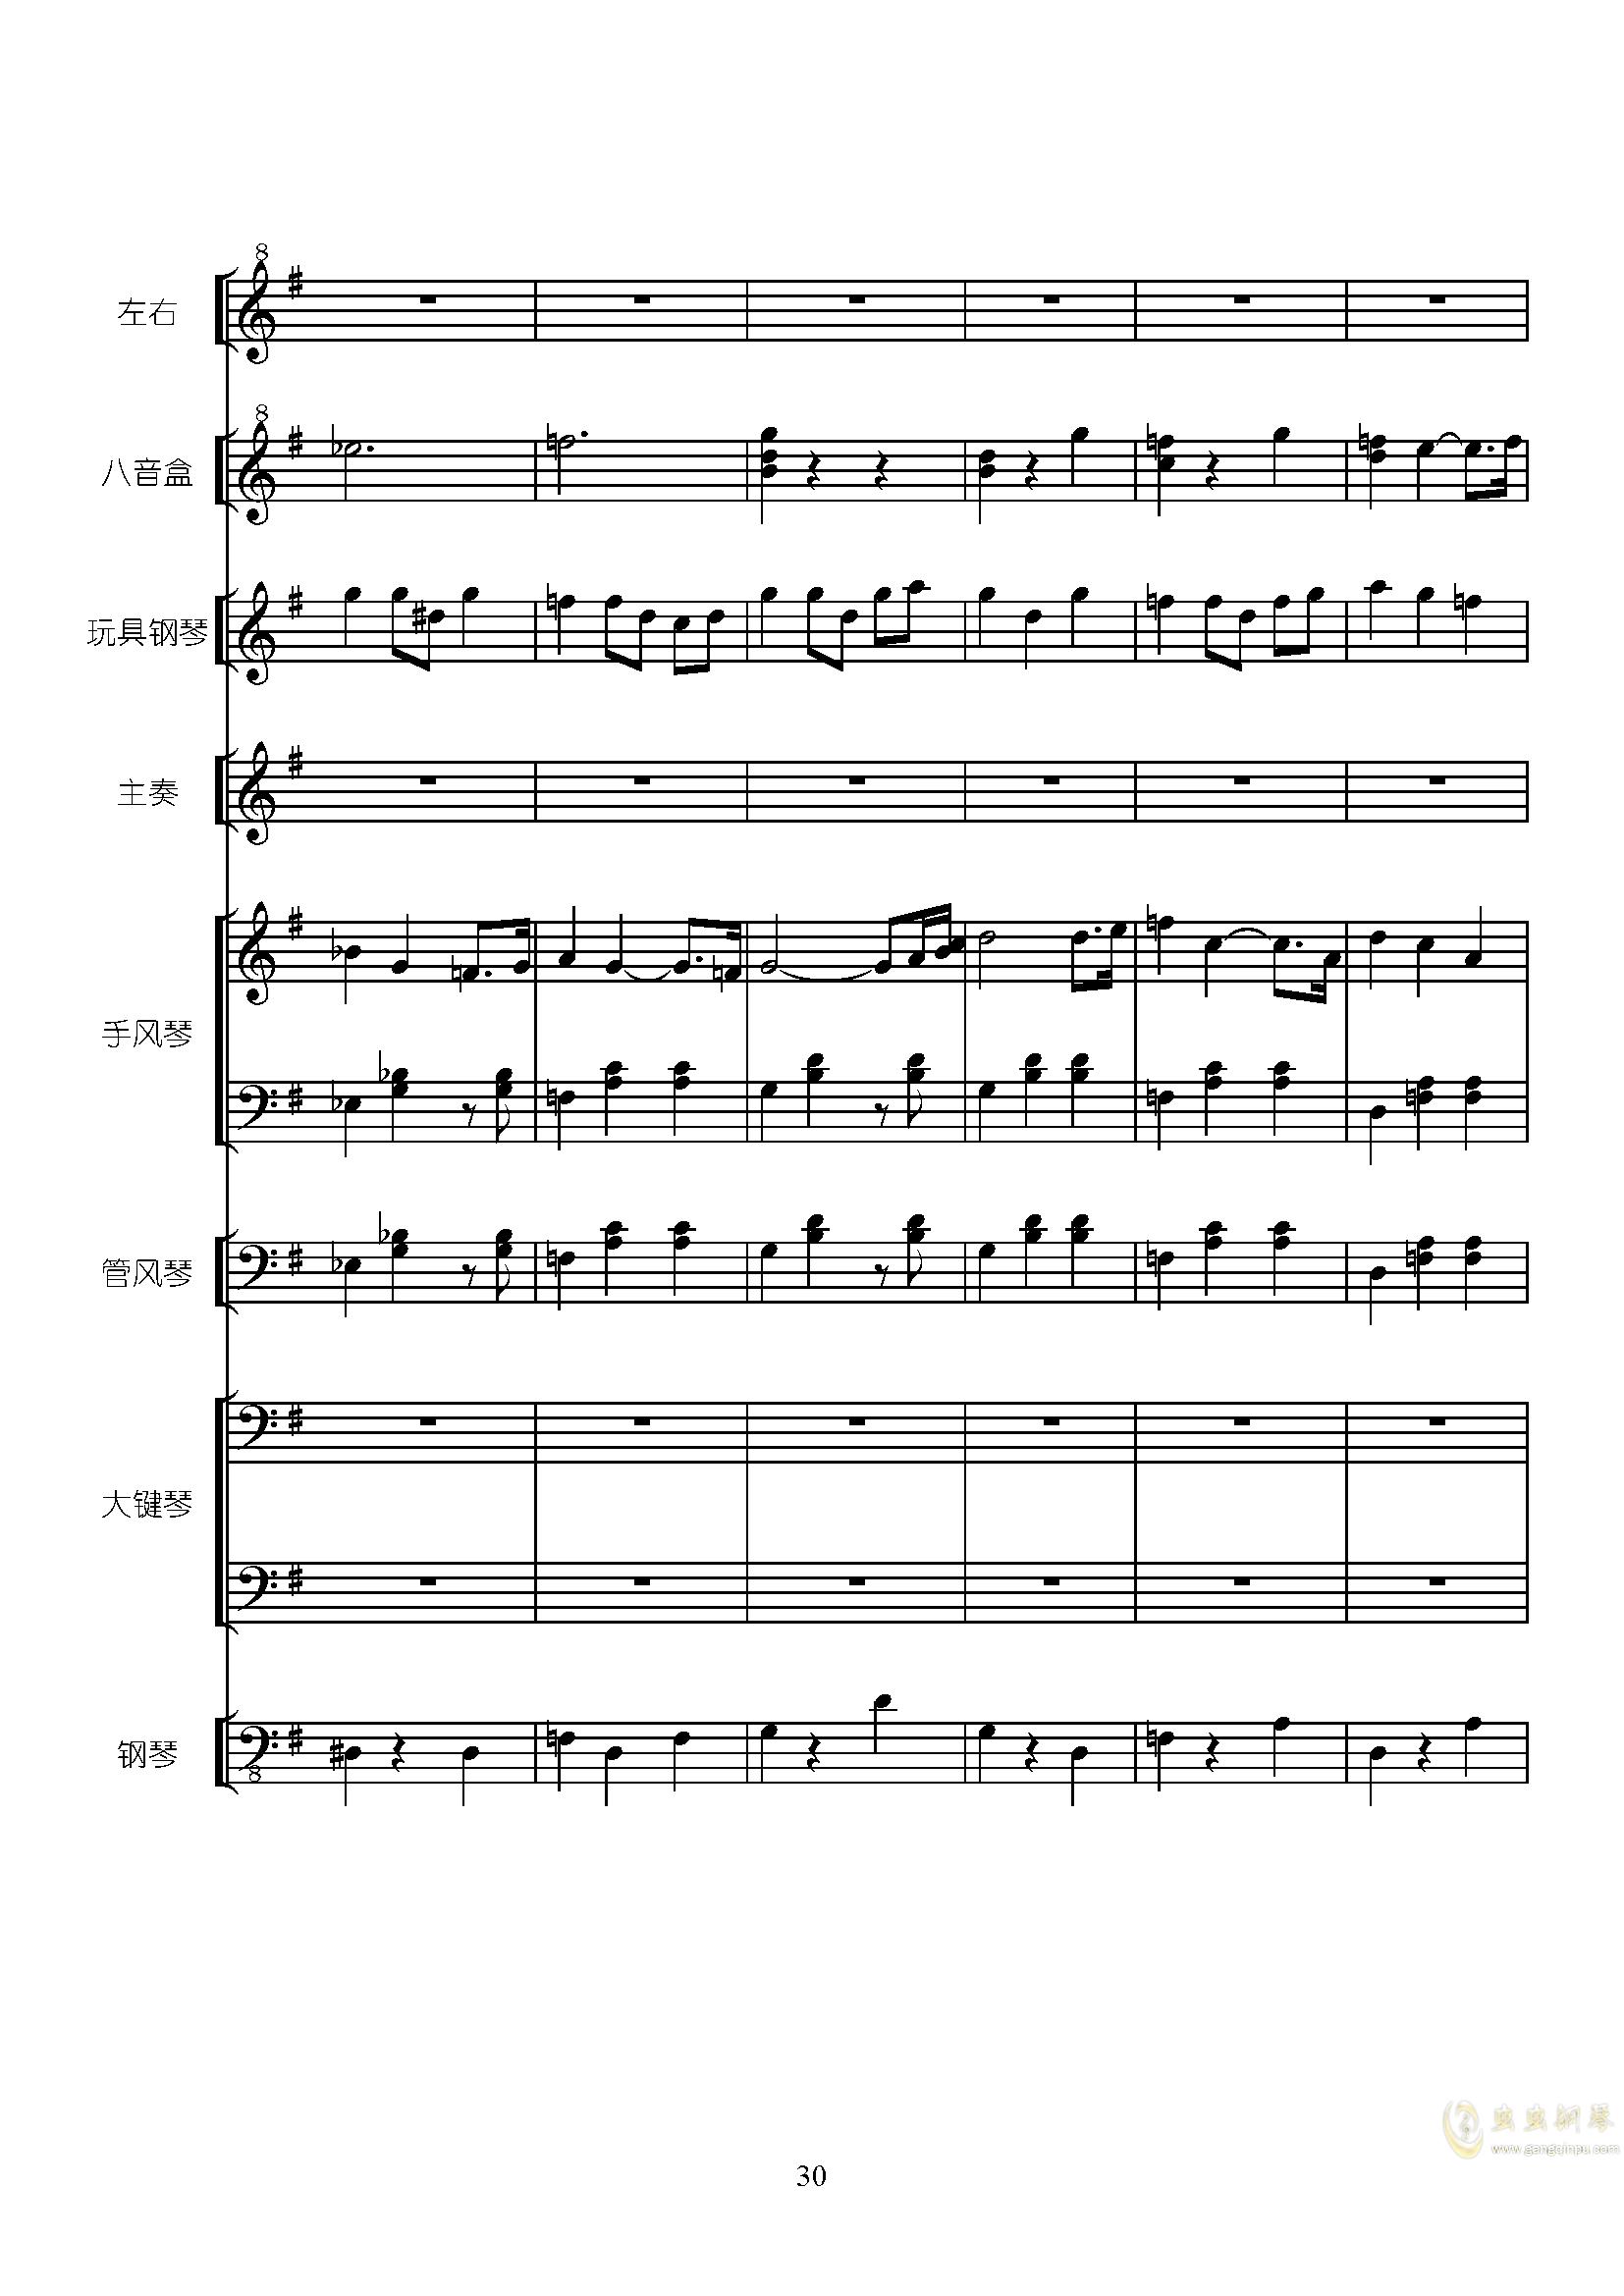 RainBowRain钢琴谱 第30页